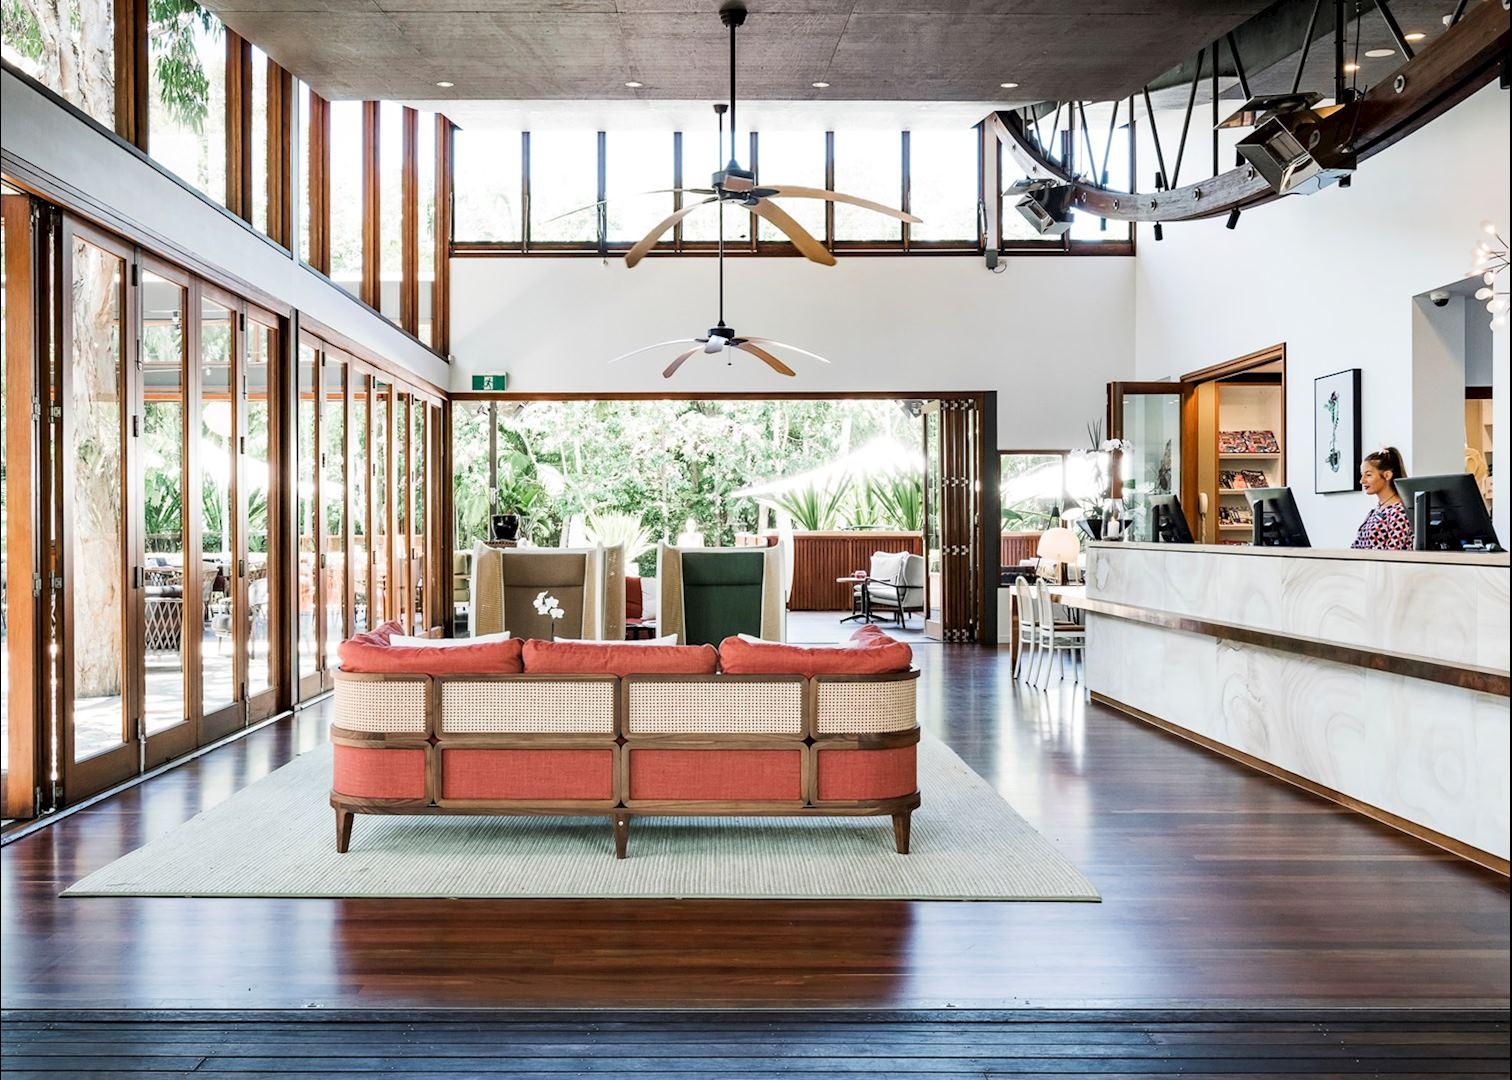 byron at byron hotels in byron bay audley travel. Black Bedroom Furniture Sets. Home Design Ideas